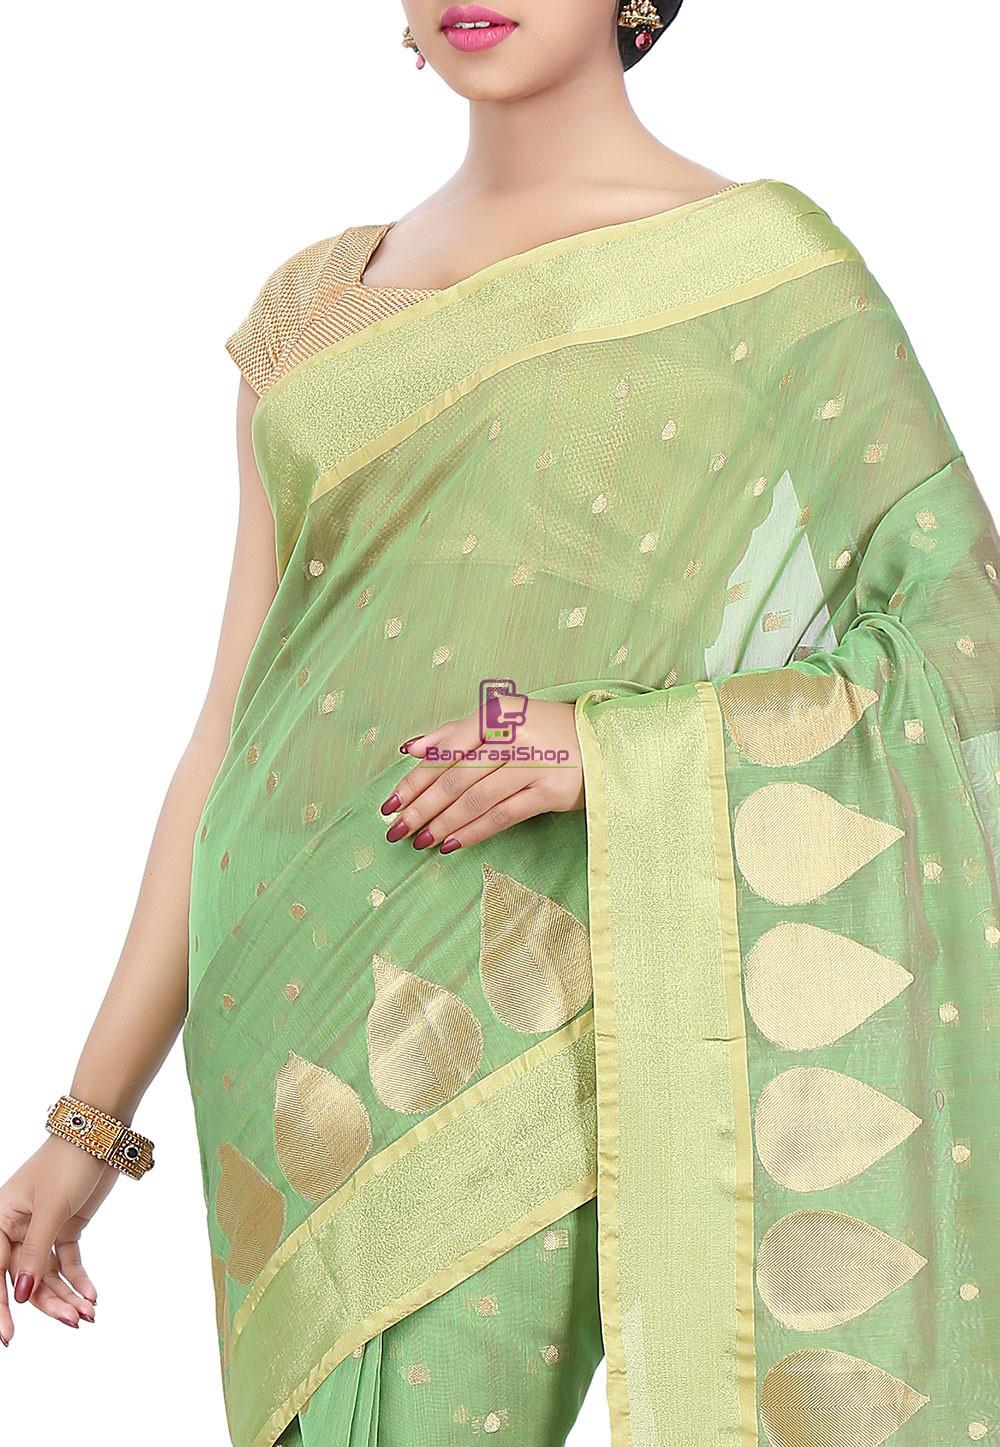 Woven Banarasi Chanderi Silk Saree in Pastel Green 2